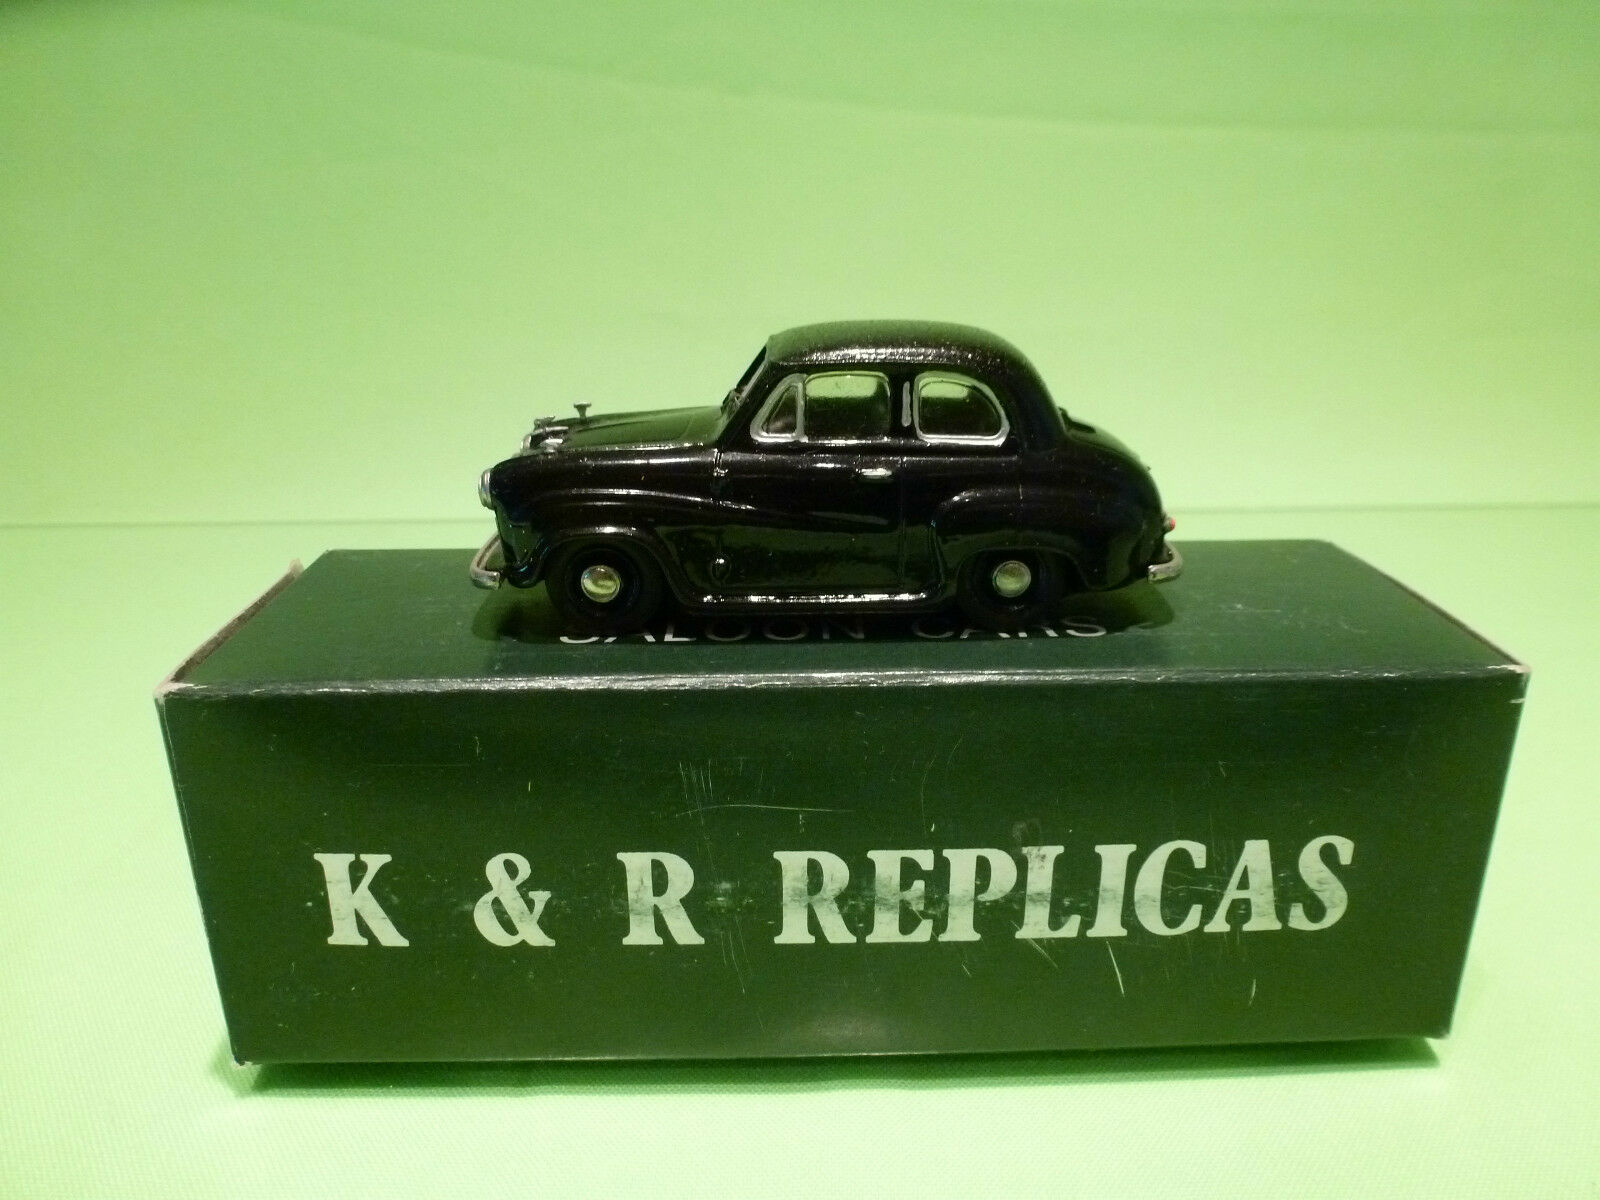 METAL BUILT KIT K&R REPLICAS1 43 AUSTIN A30 - RARE SELTEN - GOOD IN BOX